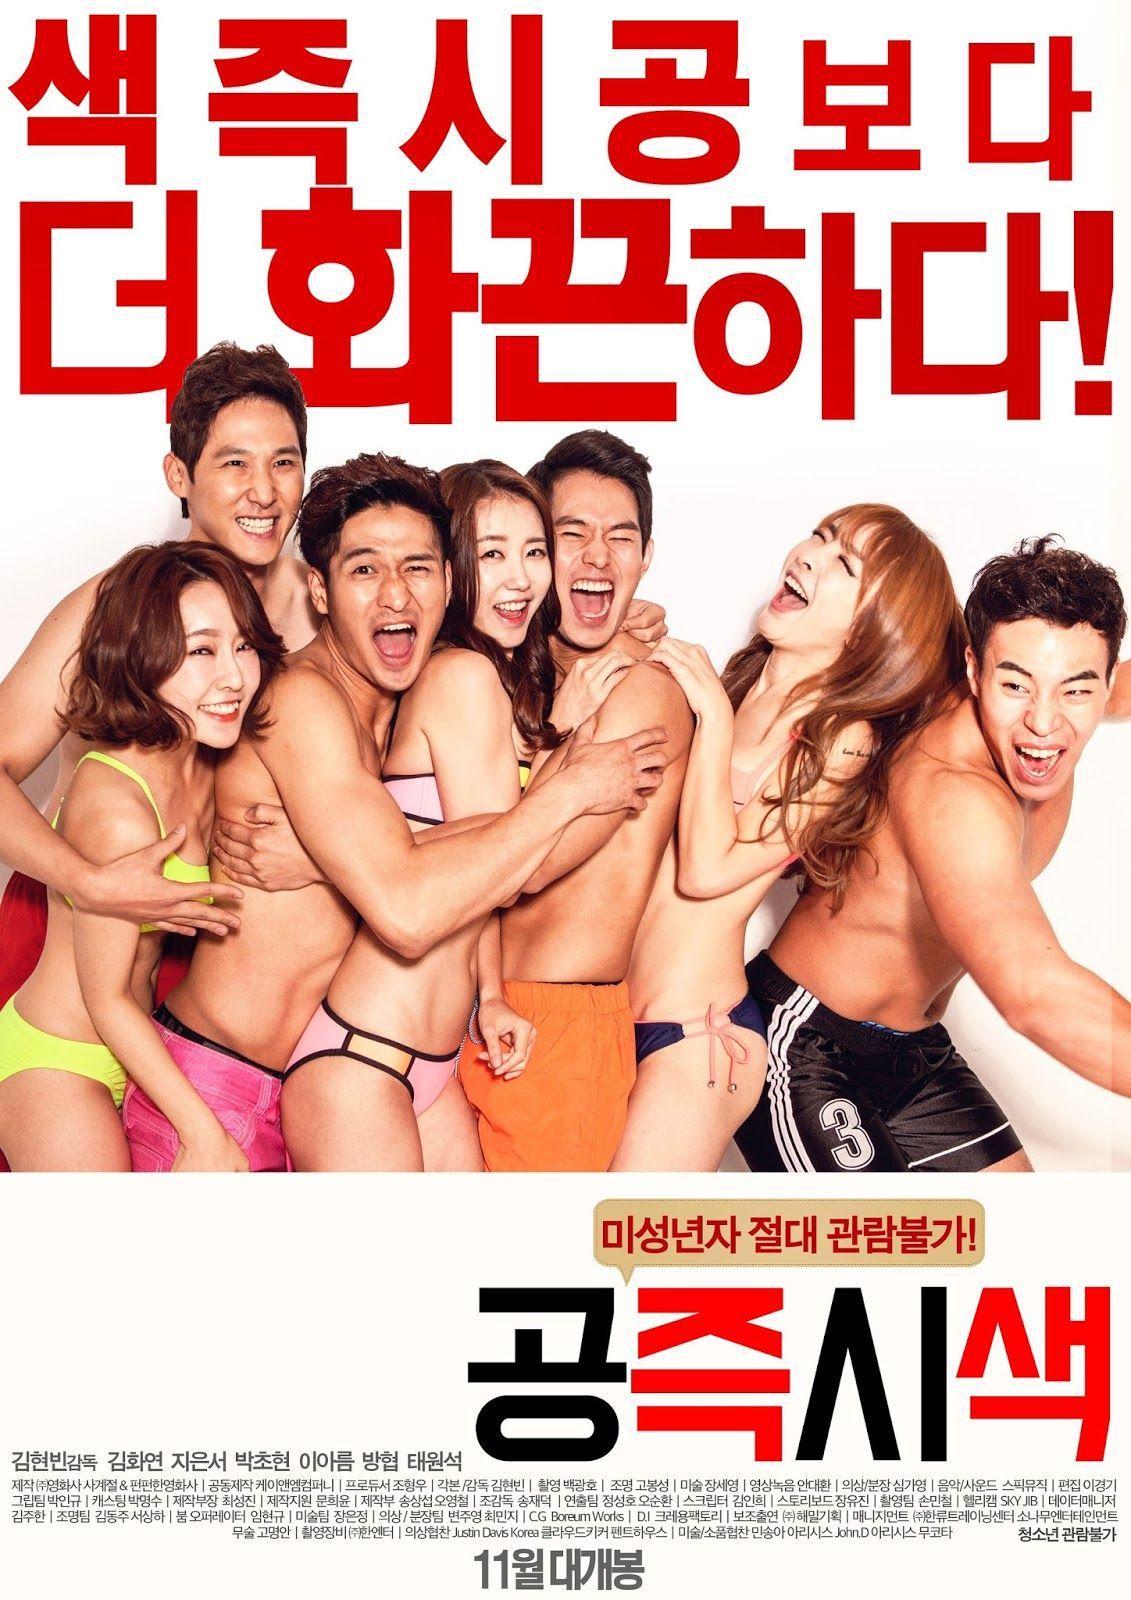 japanese pussy movie free